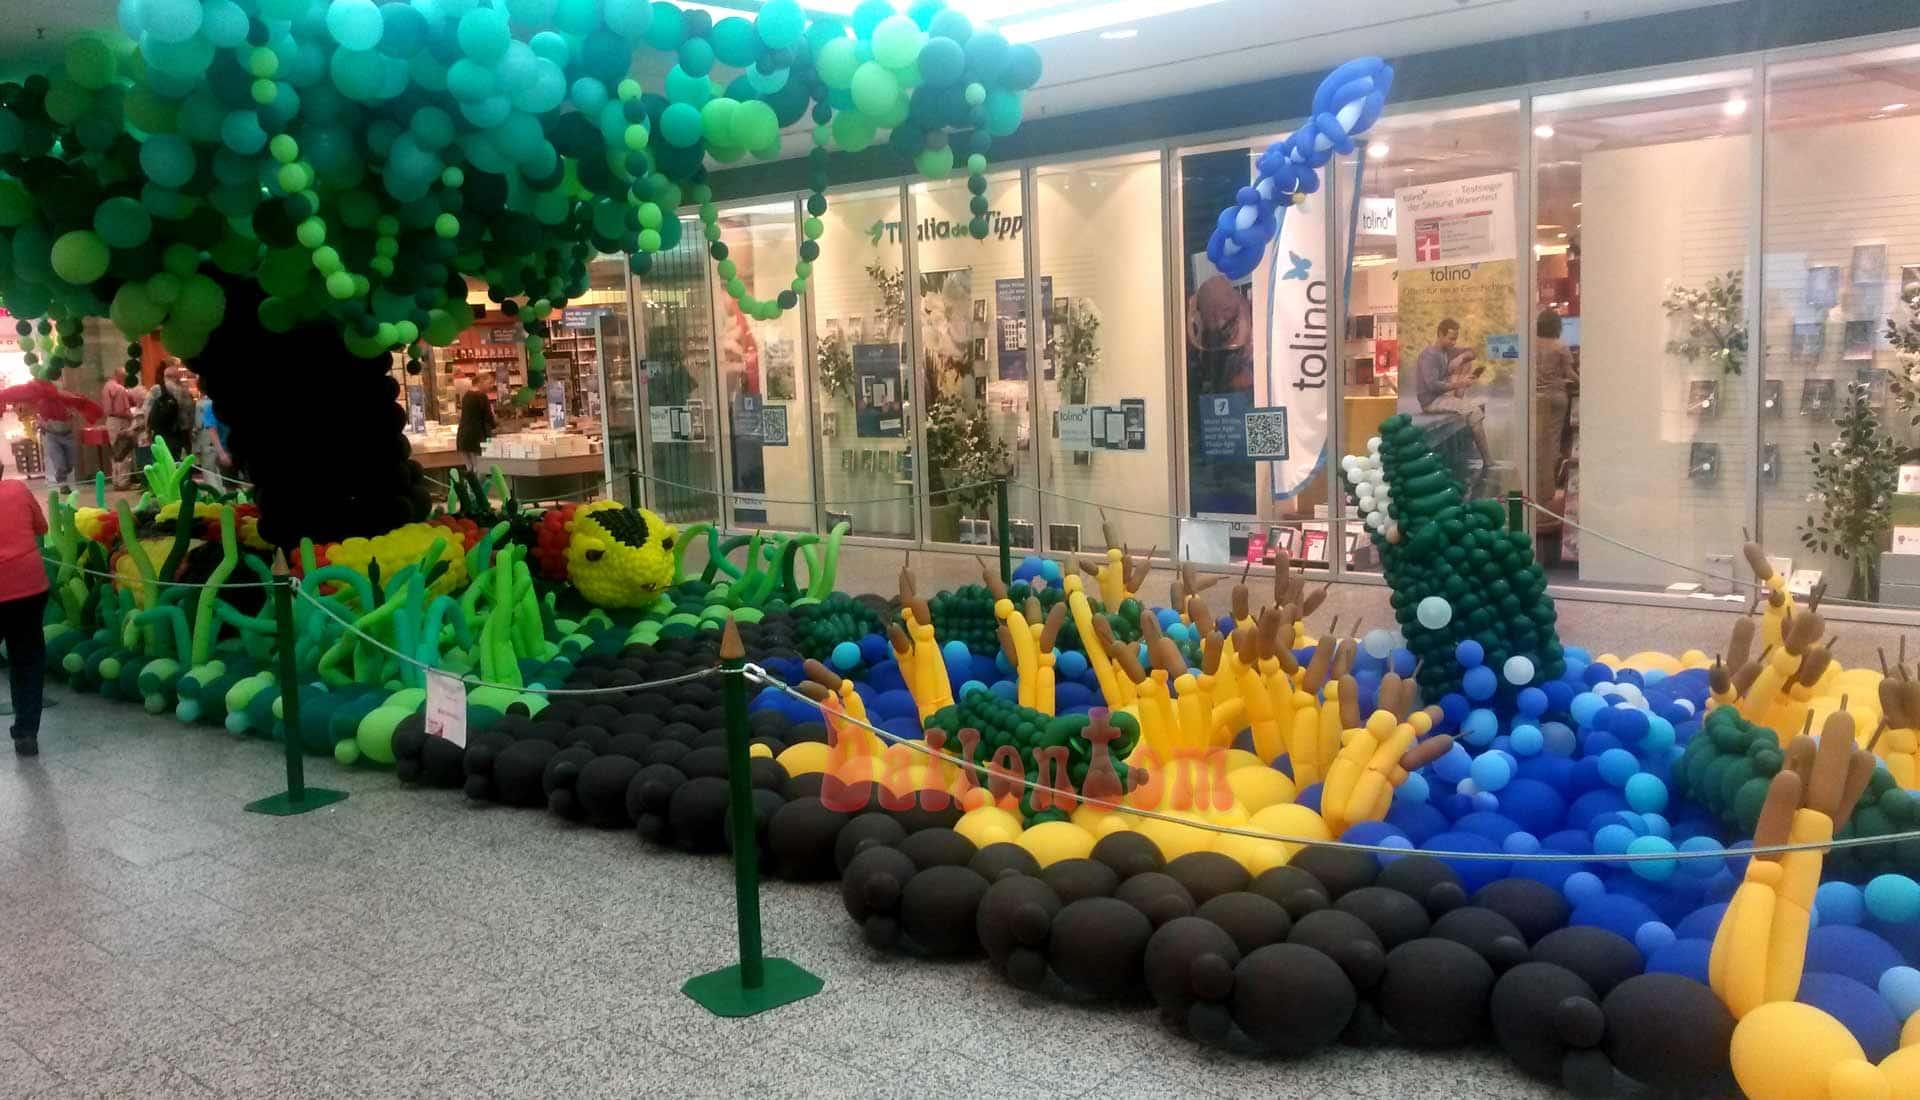 Ballonwelt im Rathauscenter Pankow in Berlin - Moto: Auf Safarie in Pankow - Bild: Krokodile